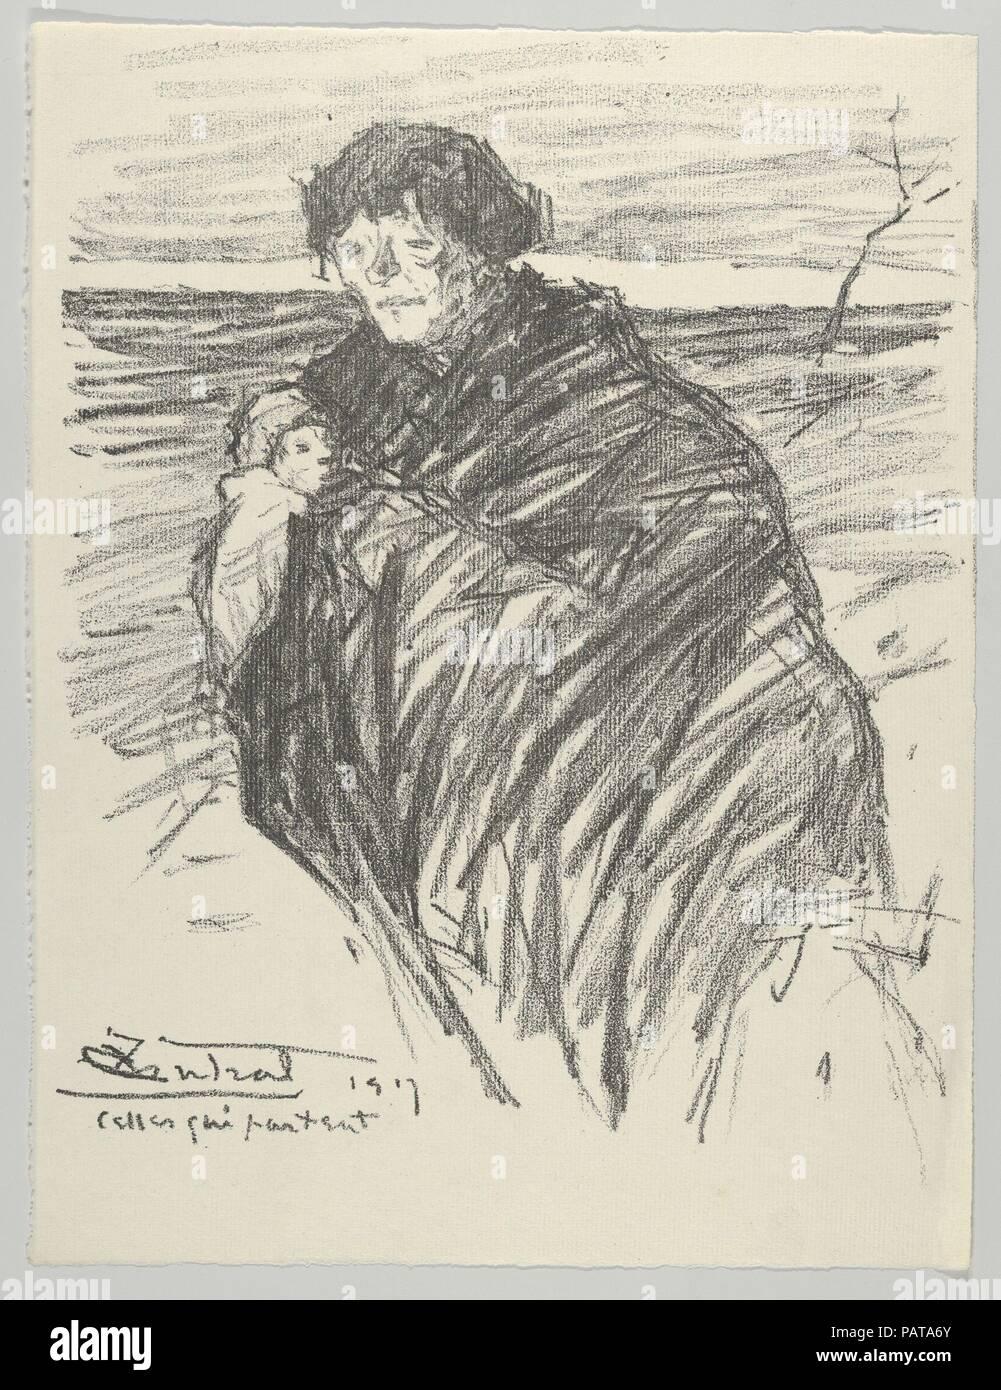 Celles Qui Partent From Les Evacus Artist Louis Robert Antral French